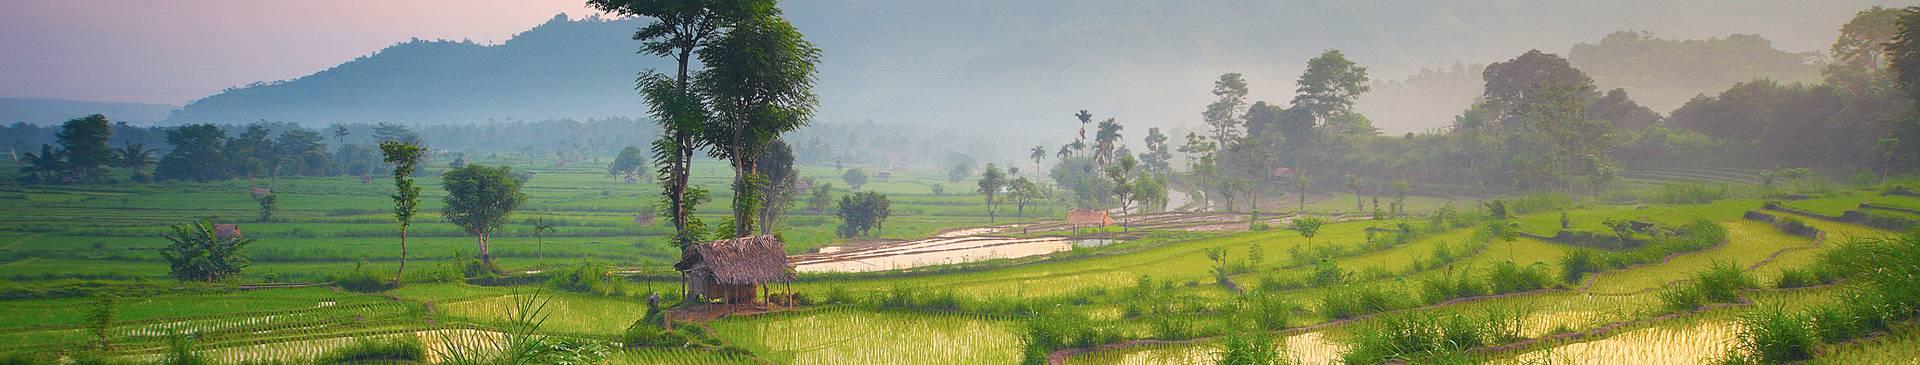 Bali nature tours